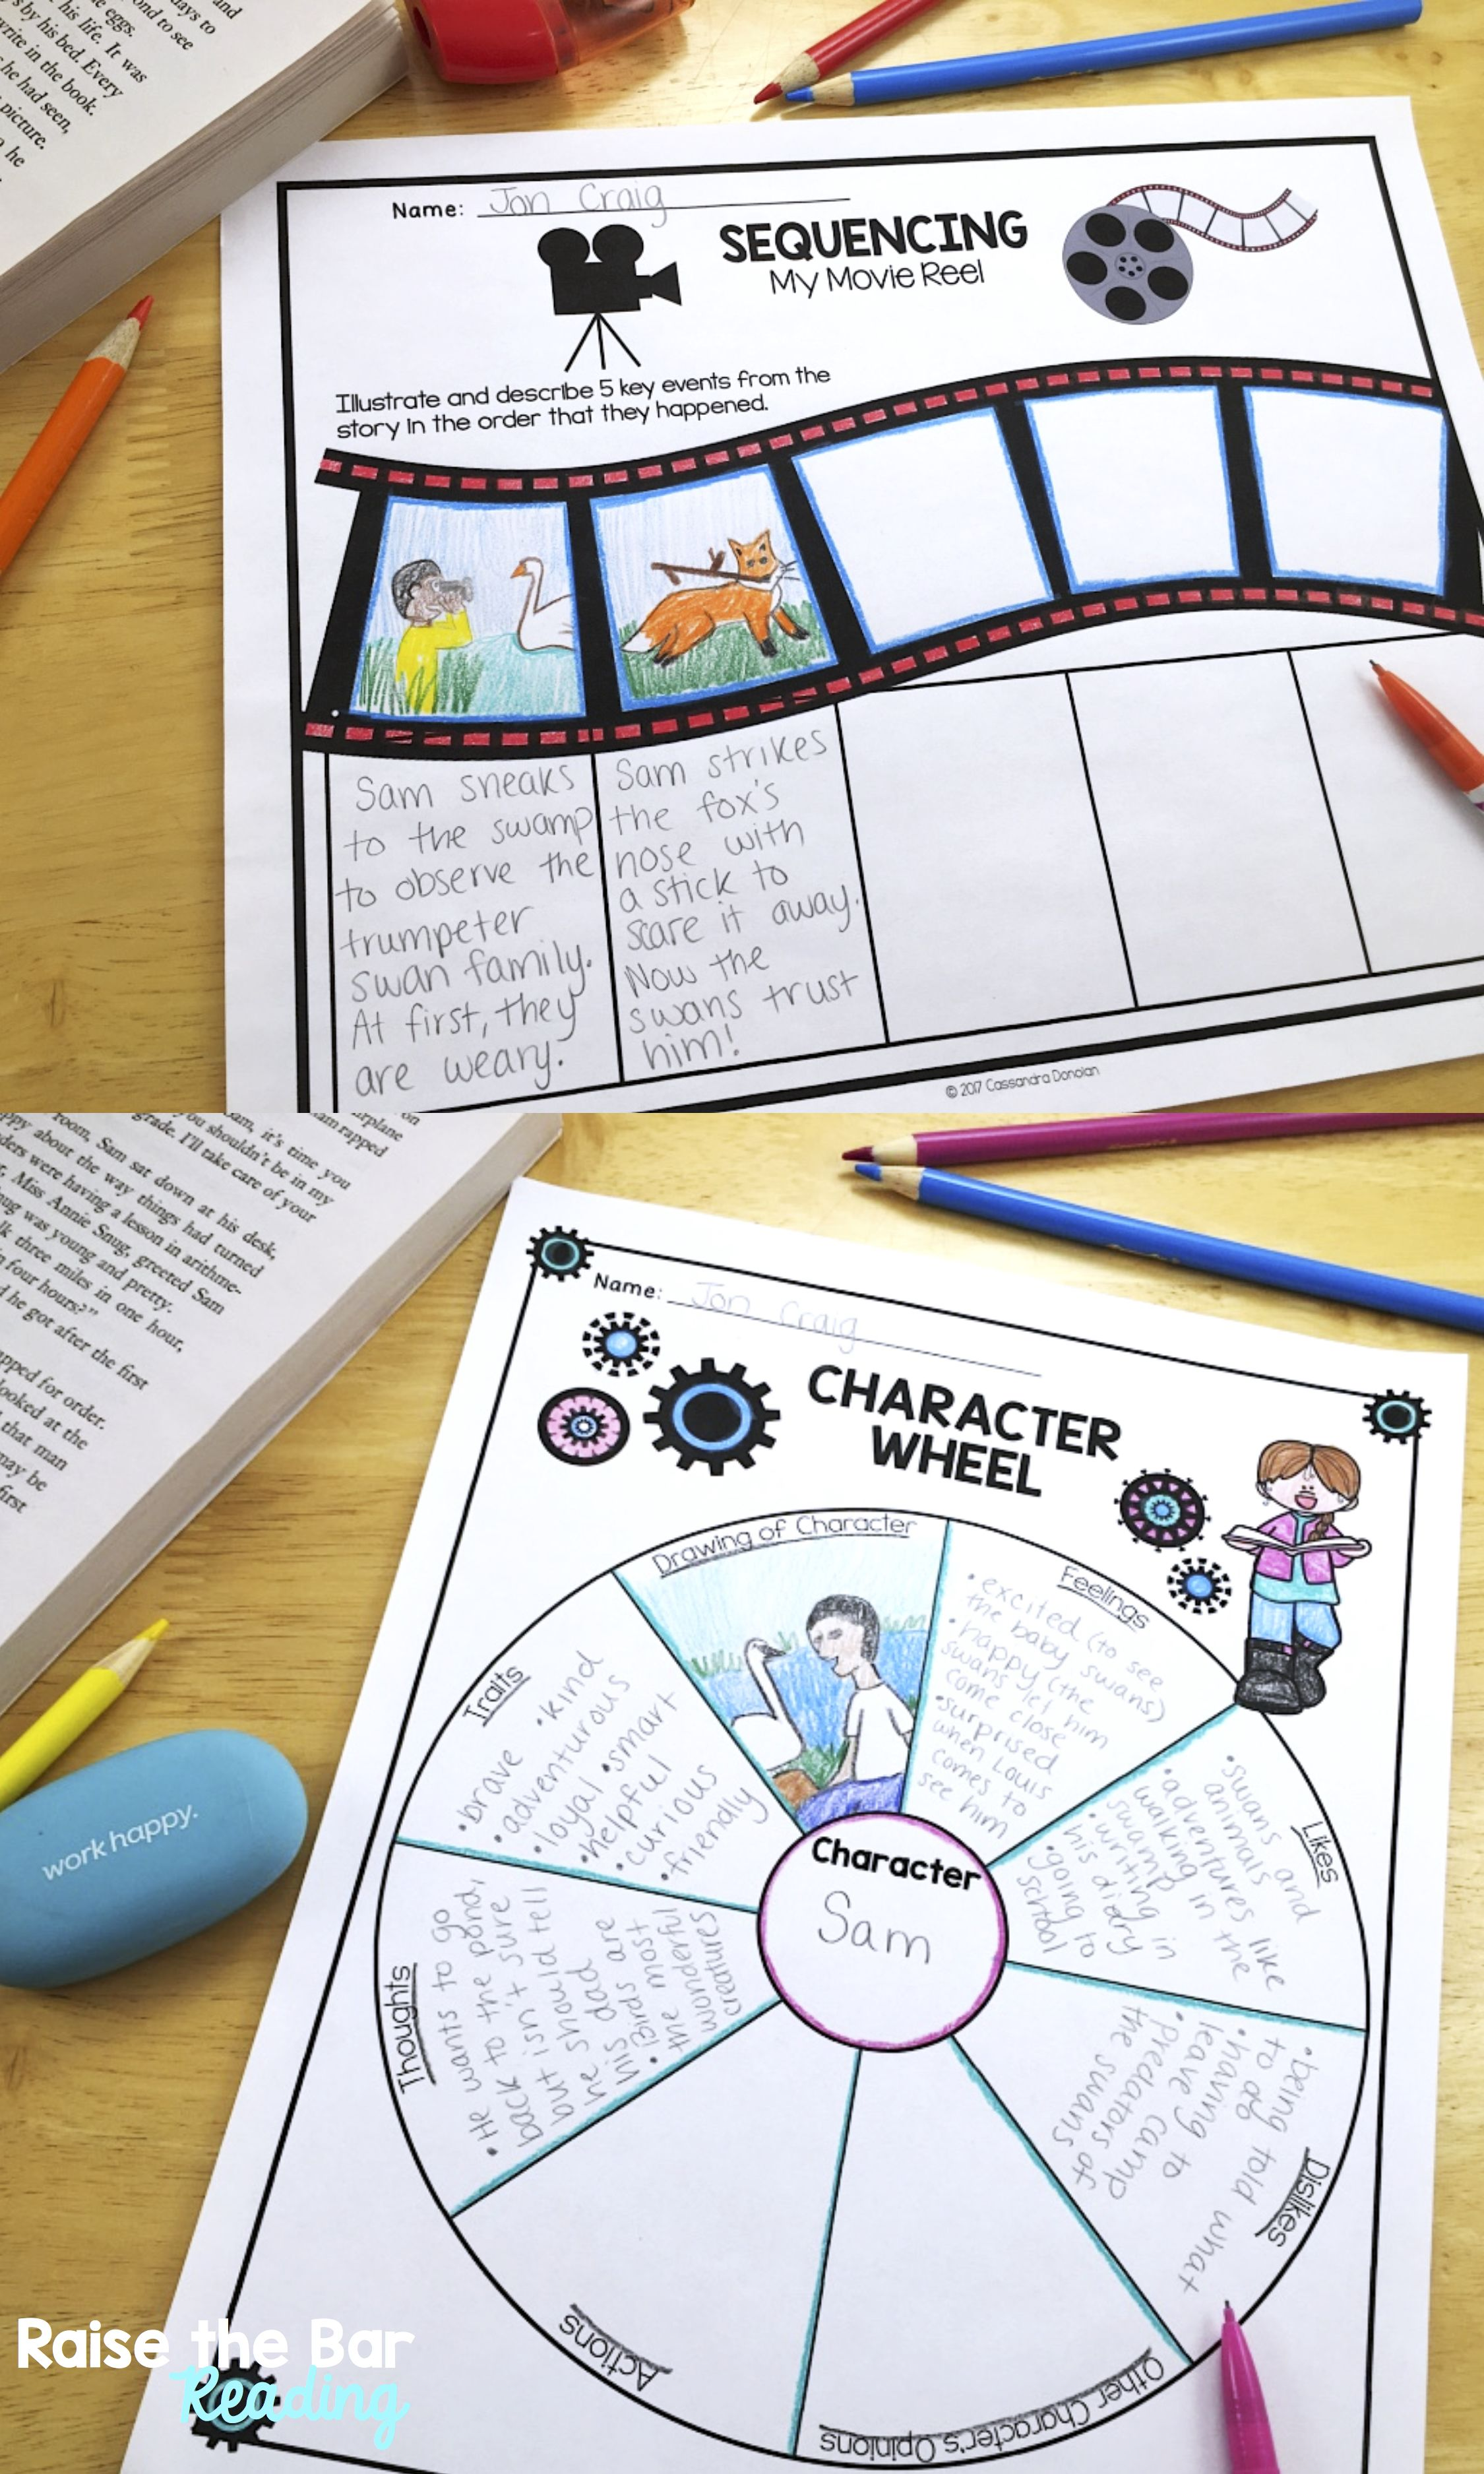 Fiction Graphic Organizers Reading Response Worksheets Distance Learning Reading Response Worksheets Graphic Organizer For Reading Reading Comprehension Grade 1 [ 3750 x 2250 Pixel ]